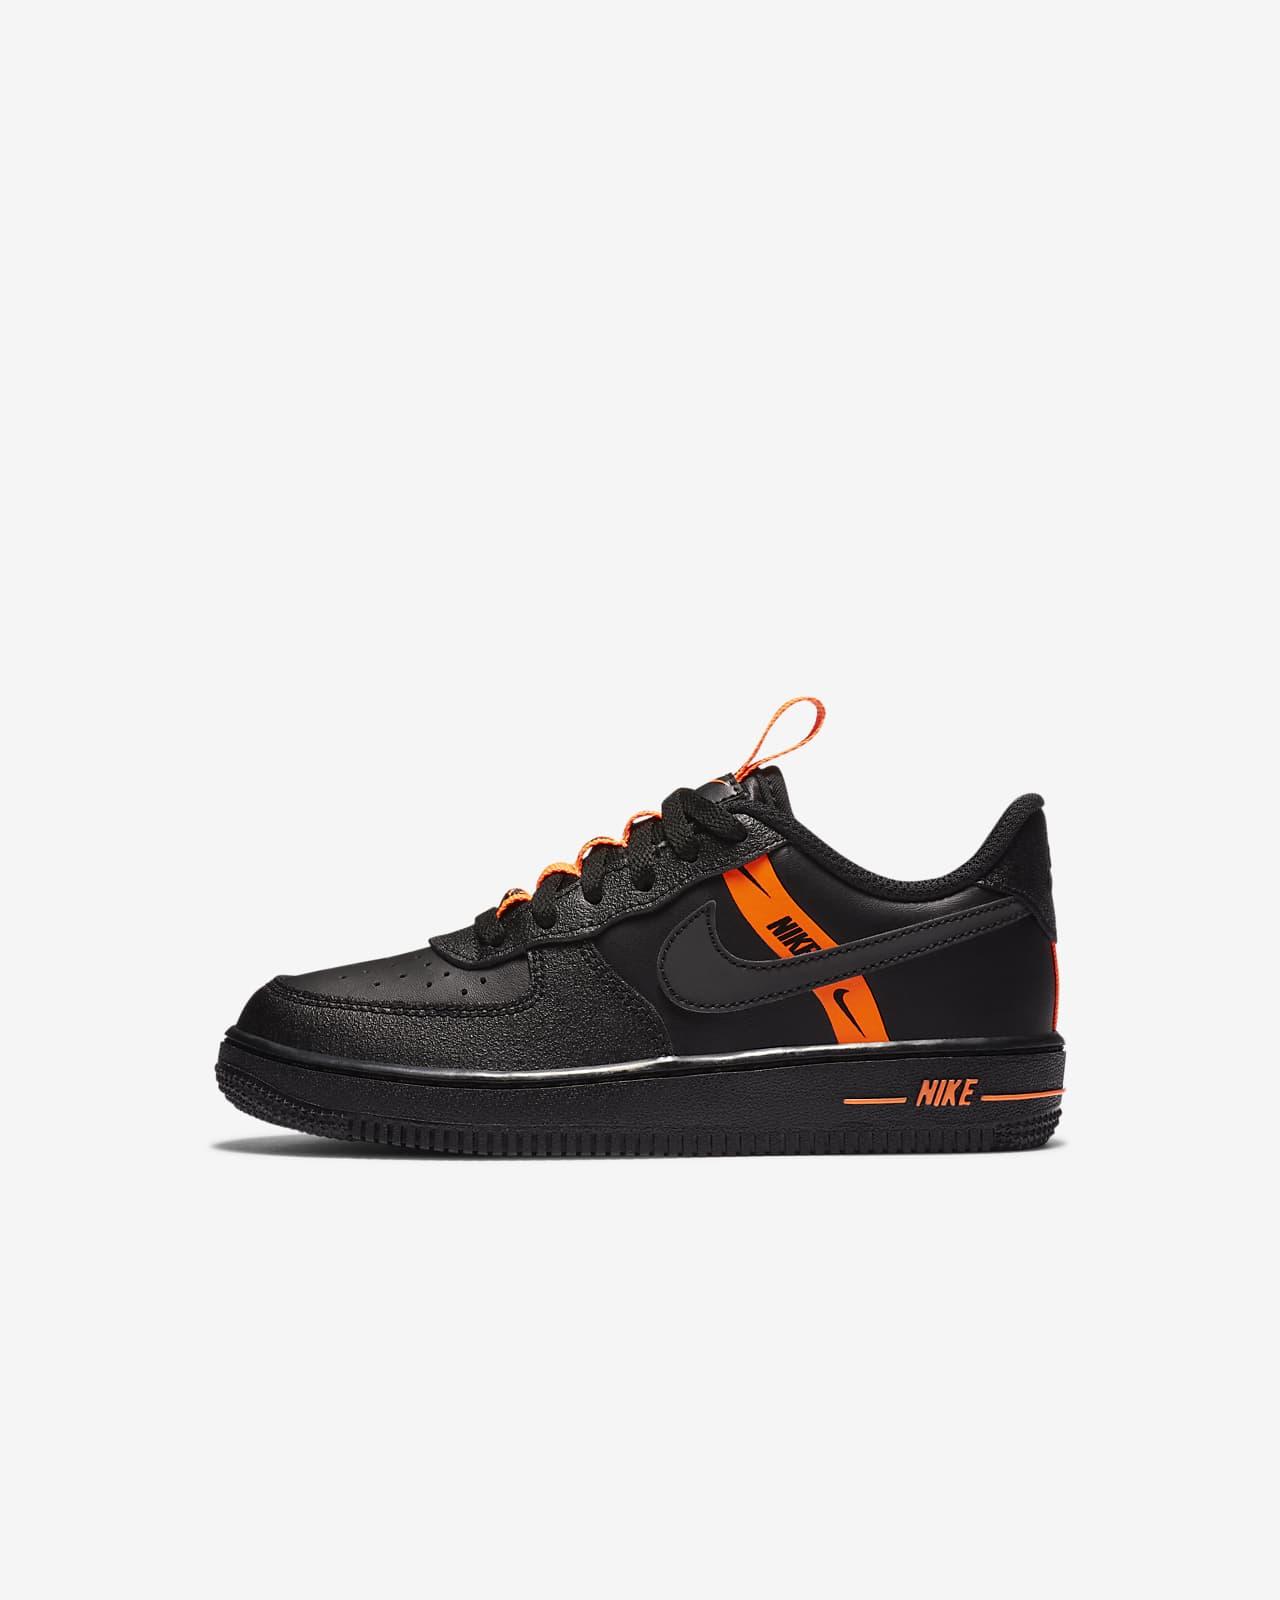 Nike Force 1 LV8 KSA 小童鞋款。Nike TW